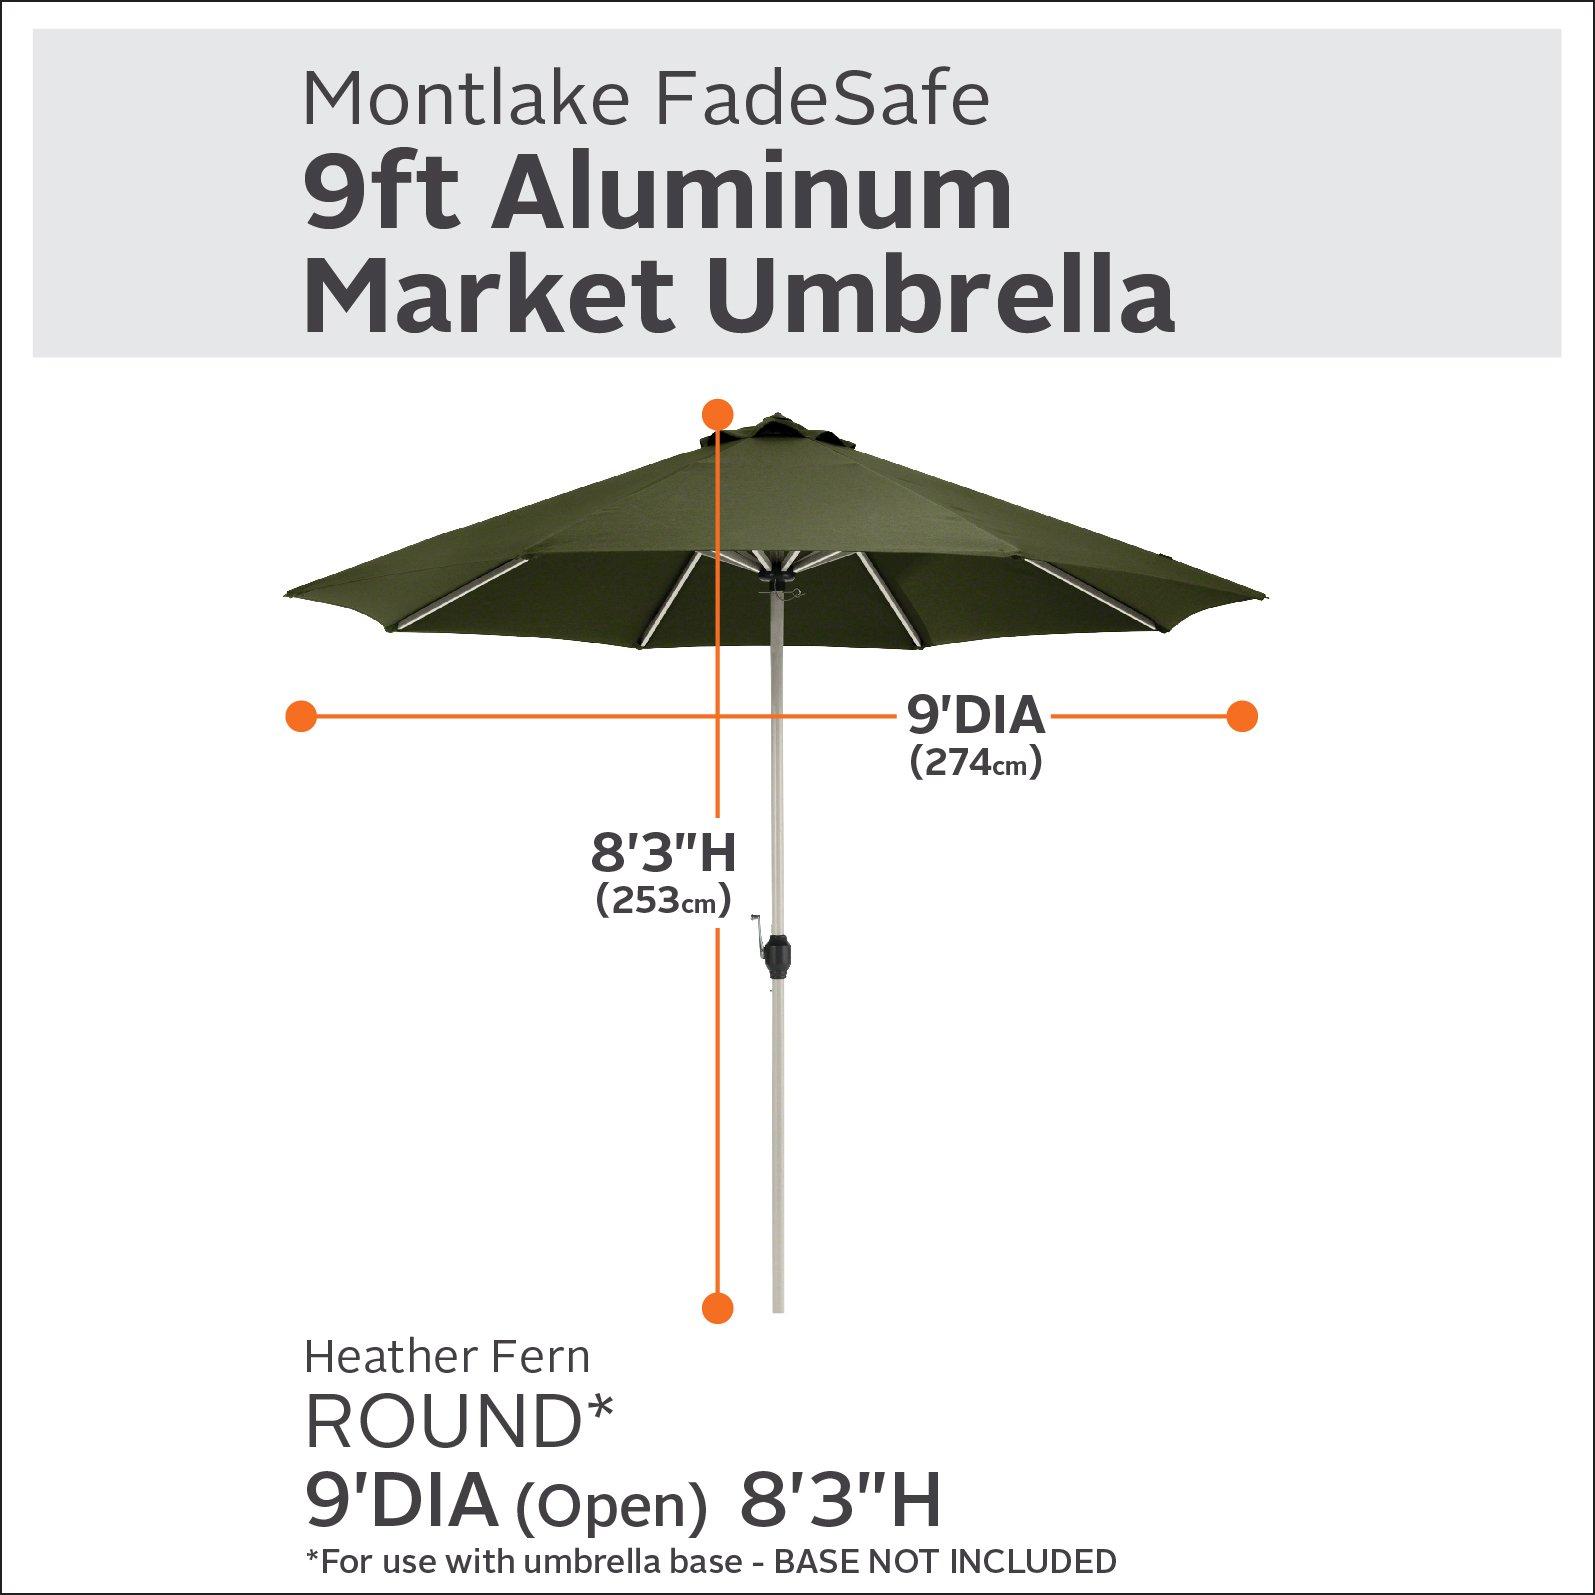 Classic Accessories Montlake FadeSafe 9-Foot Round Aluminum Patio Umbrella, Heather Fern by Classic Accessories (Image #1)